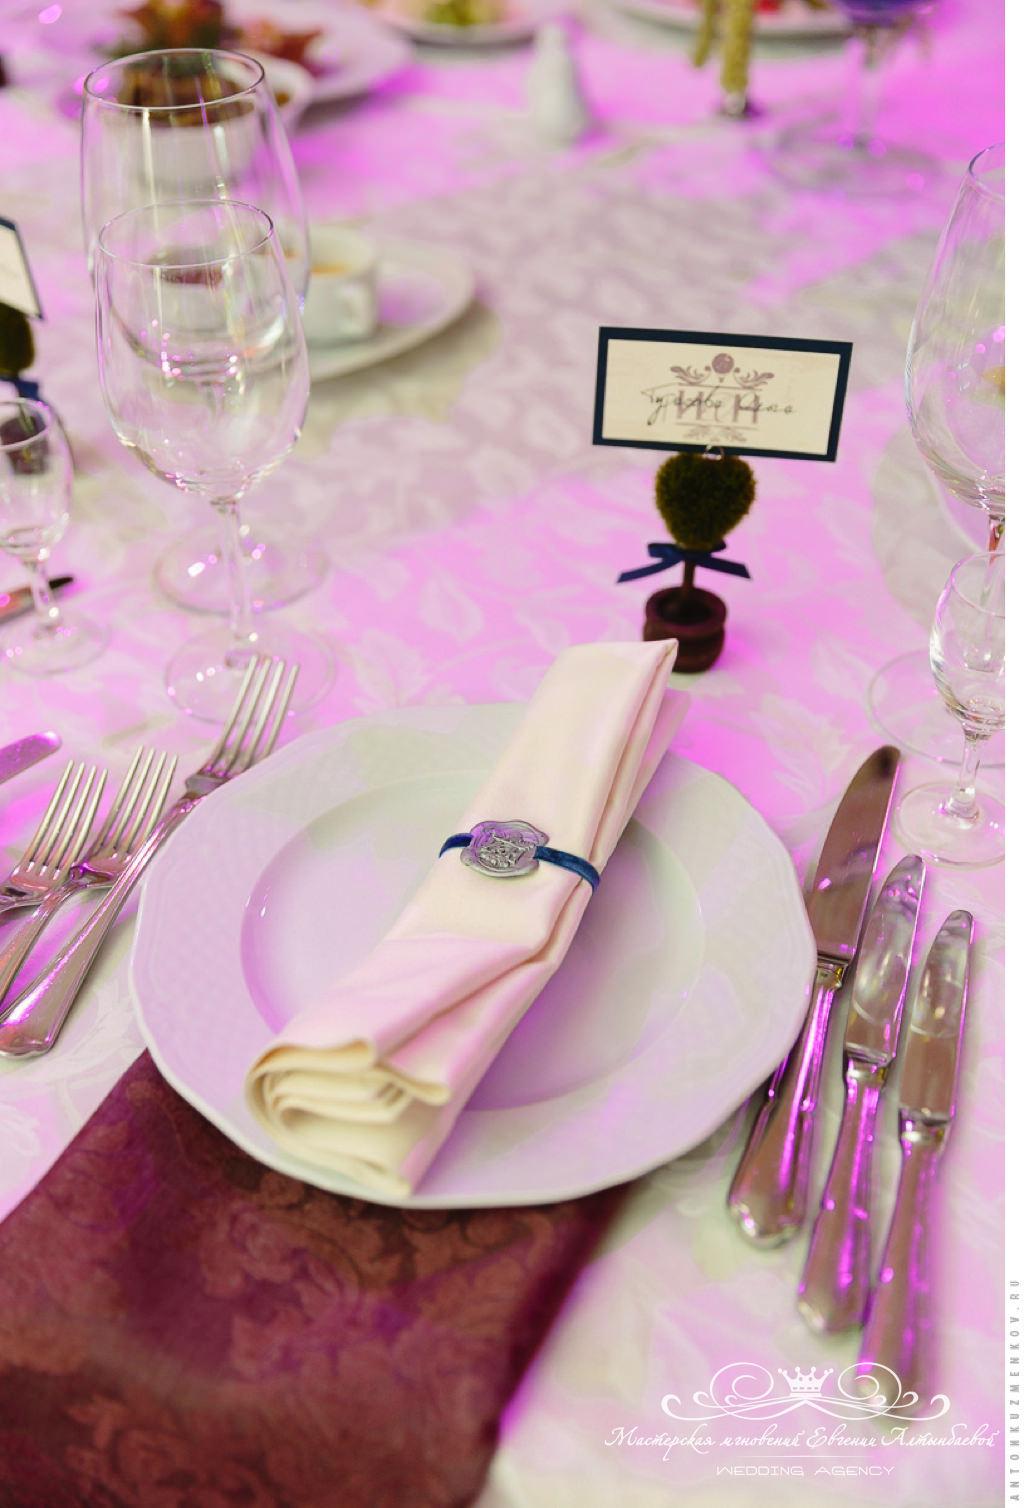 Оформление салфеток на свадьбе, карточки рассадки